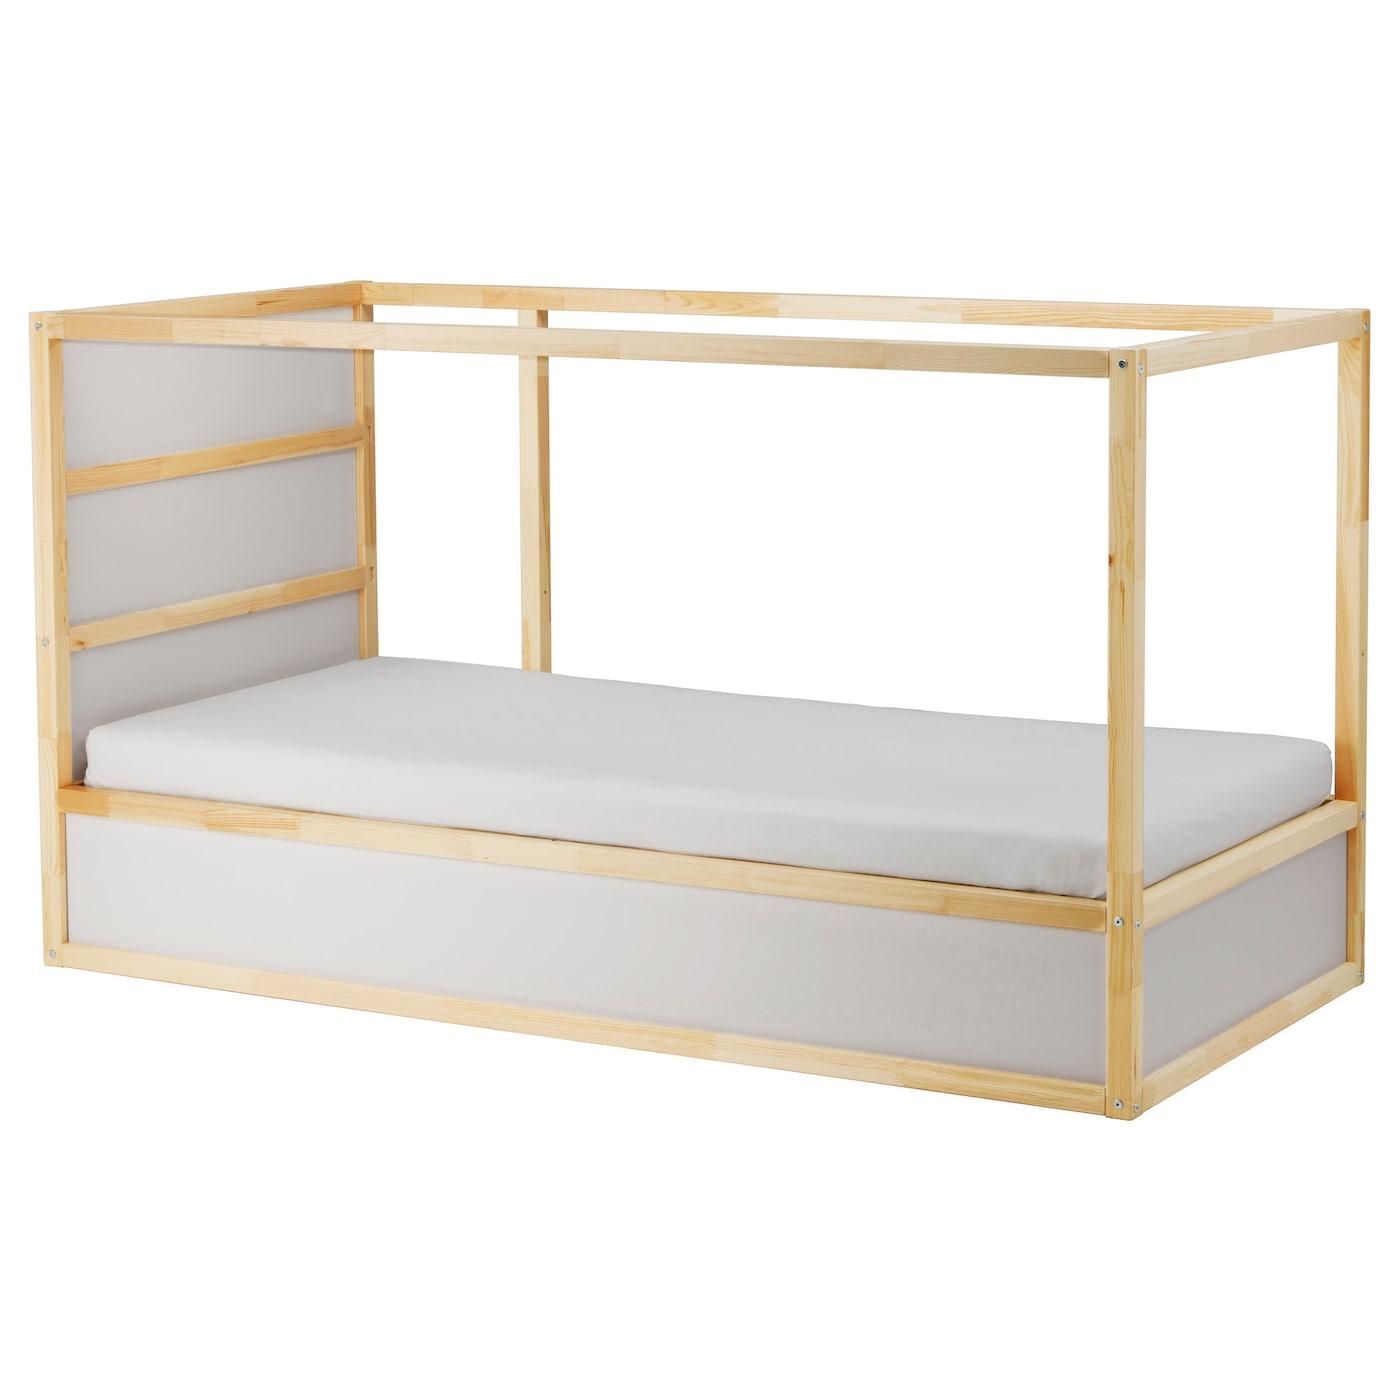 KURA Lit réversible, blanc, pin, 90x200 cm IKEA